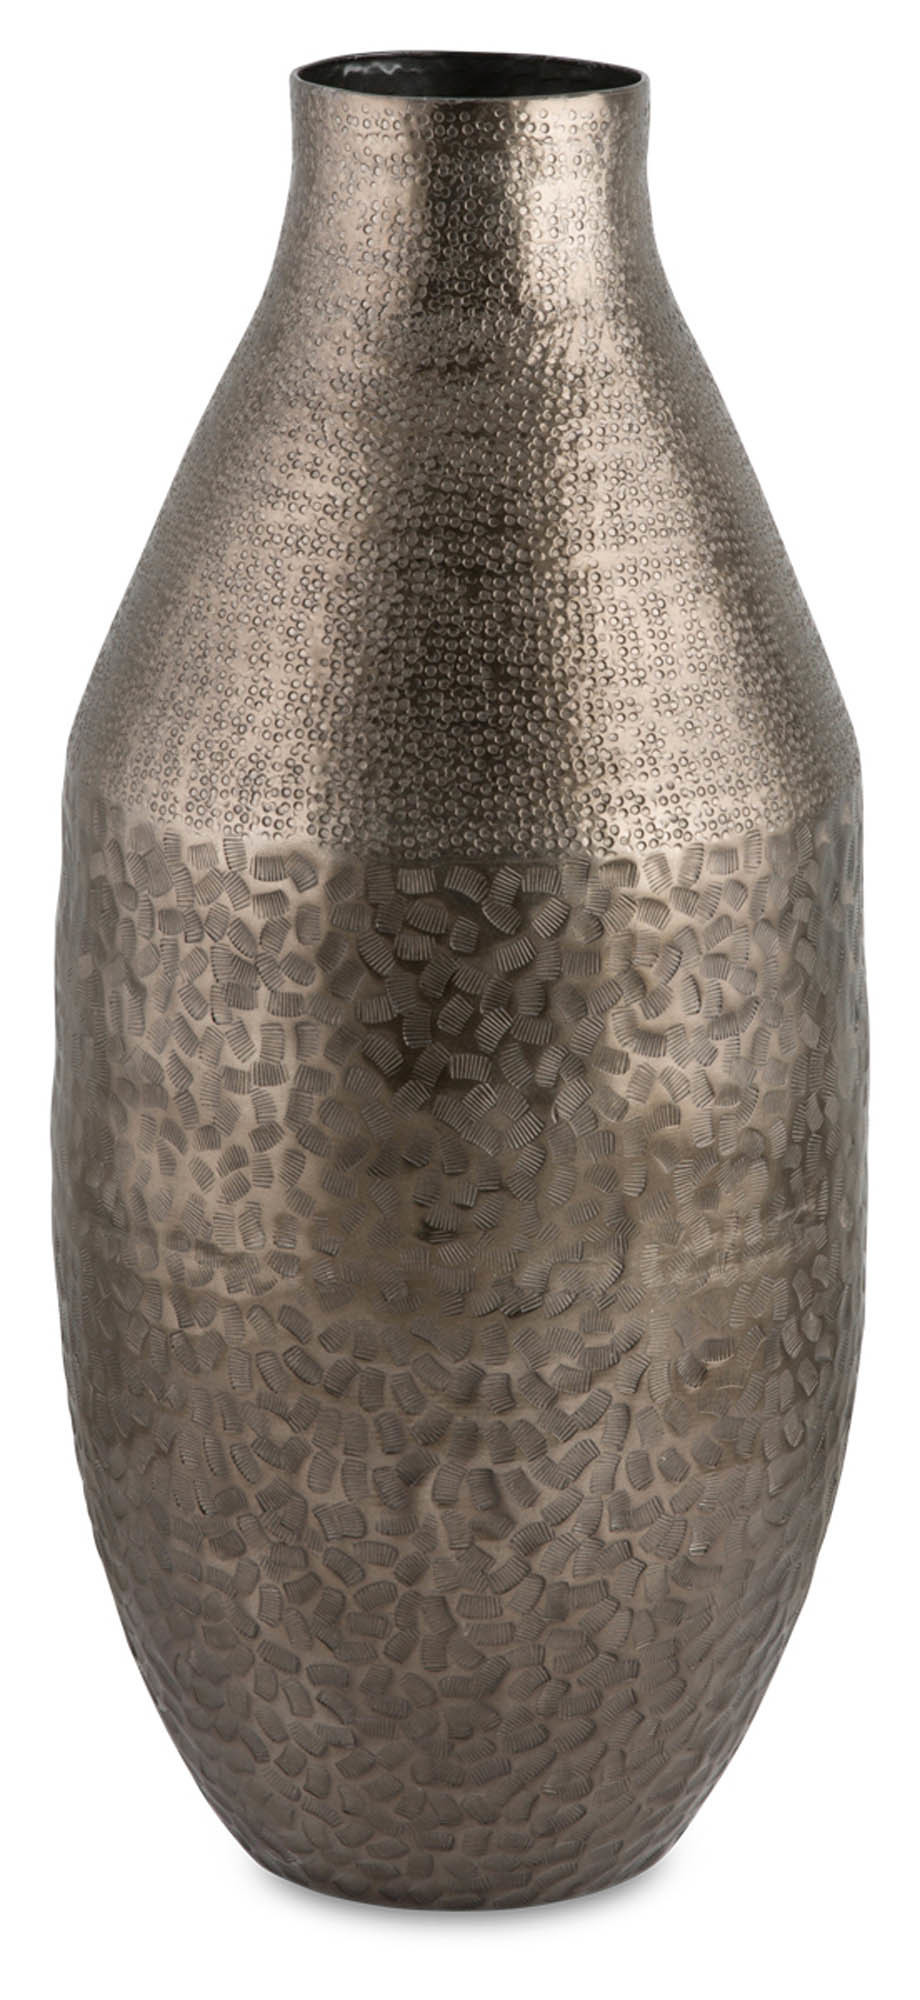 hammered metal vases silver of new hammered metal bottle vase lifestyle tradersvases ebay with regard to new hammered metal bottle vase lifestyle traders vases